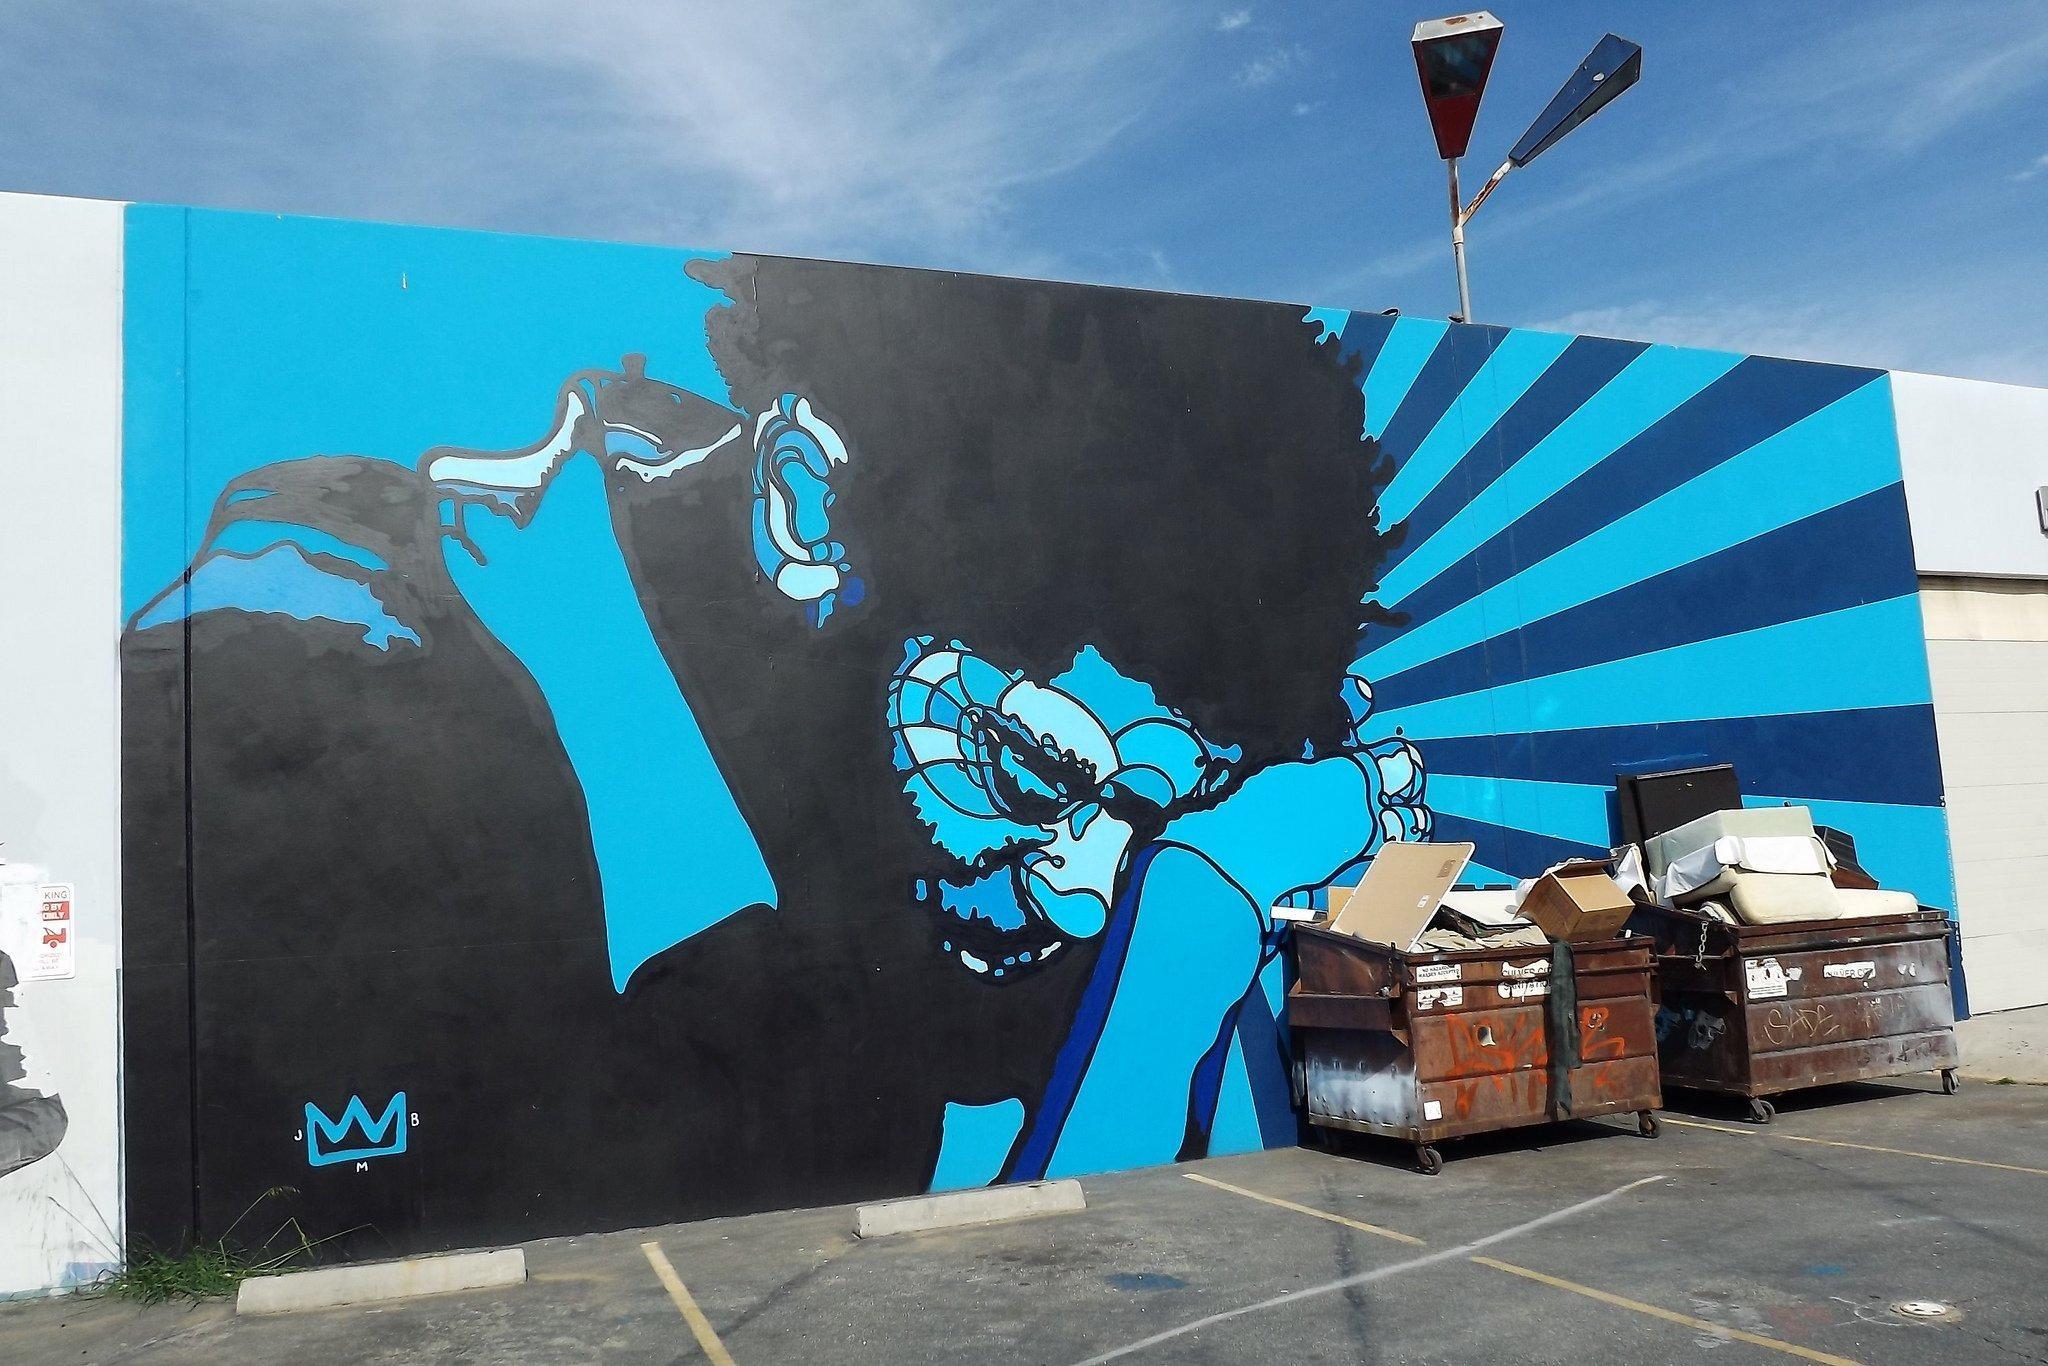 Los Angeles California Pacific Buildings Cities Graffiti Colors Regarding Los Angeles Wall Art (Image 10 of 20)